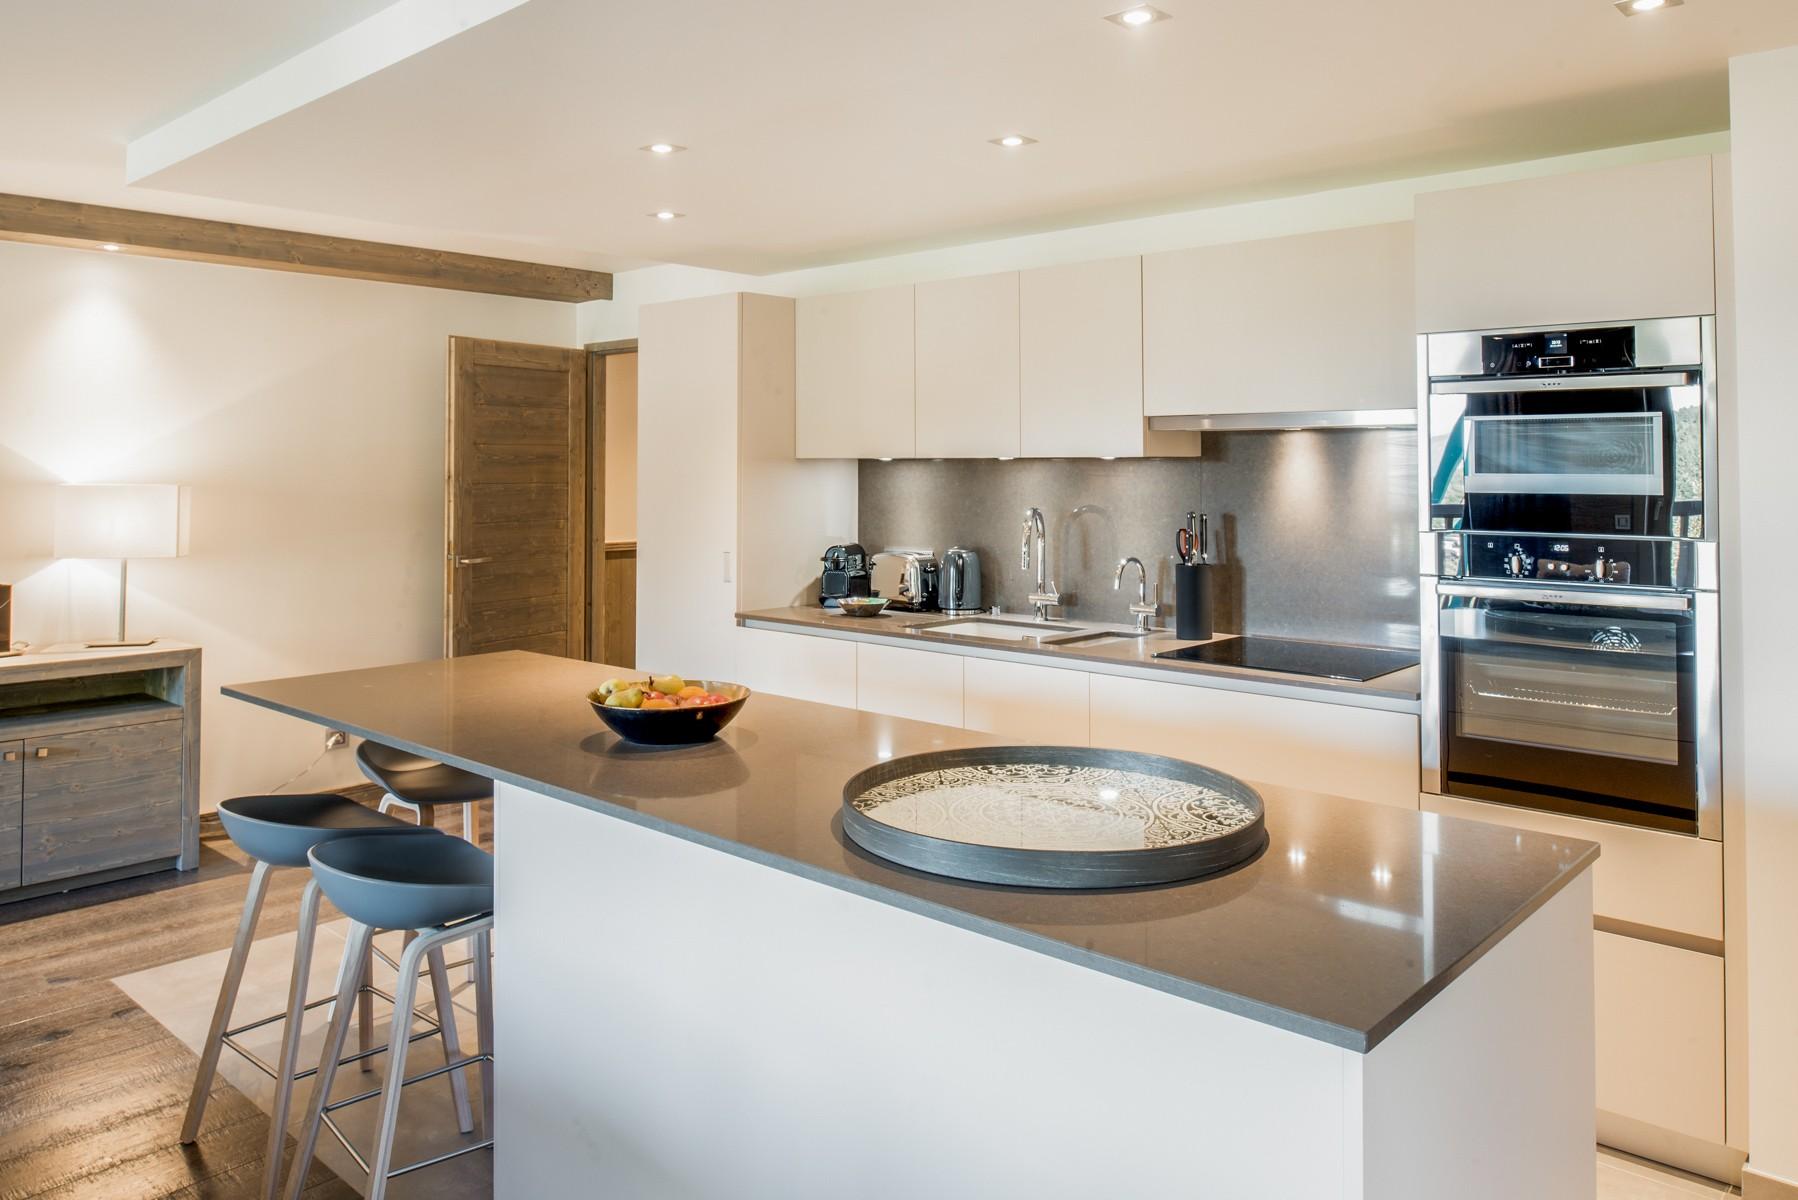 Courchevel 1650 Location Appartement Luxe Amurile Cuisine 2